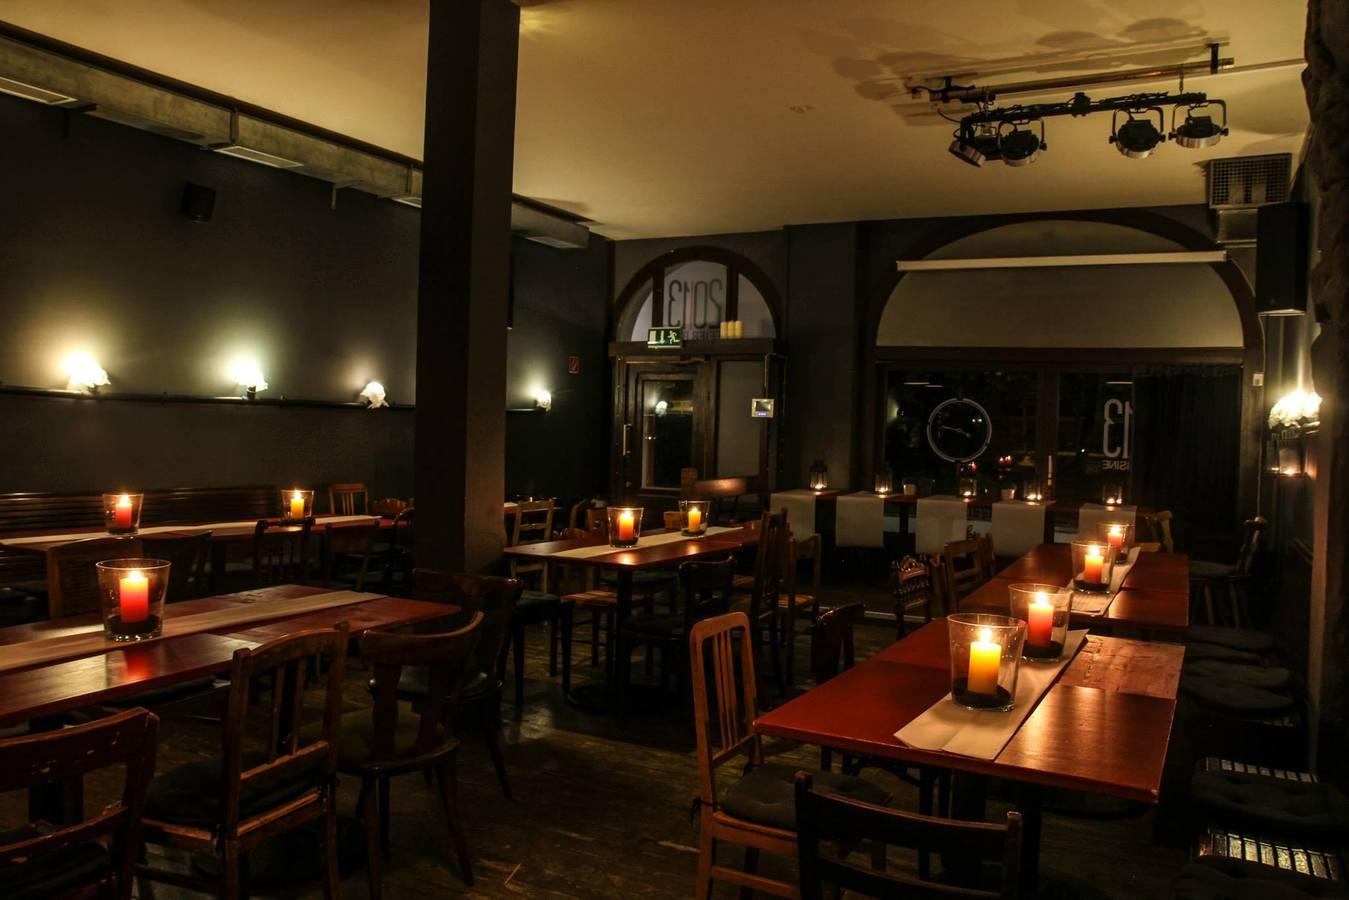 Feier Bar Bielefeld